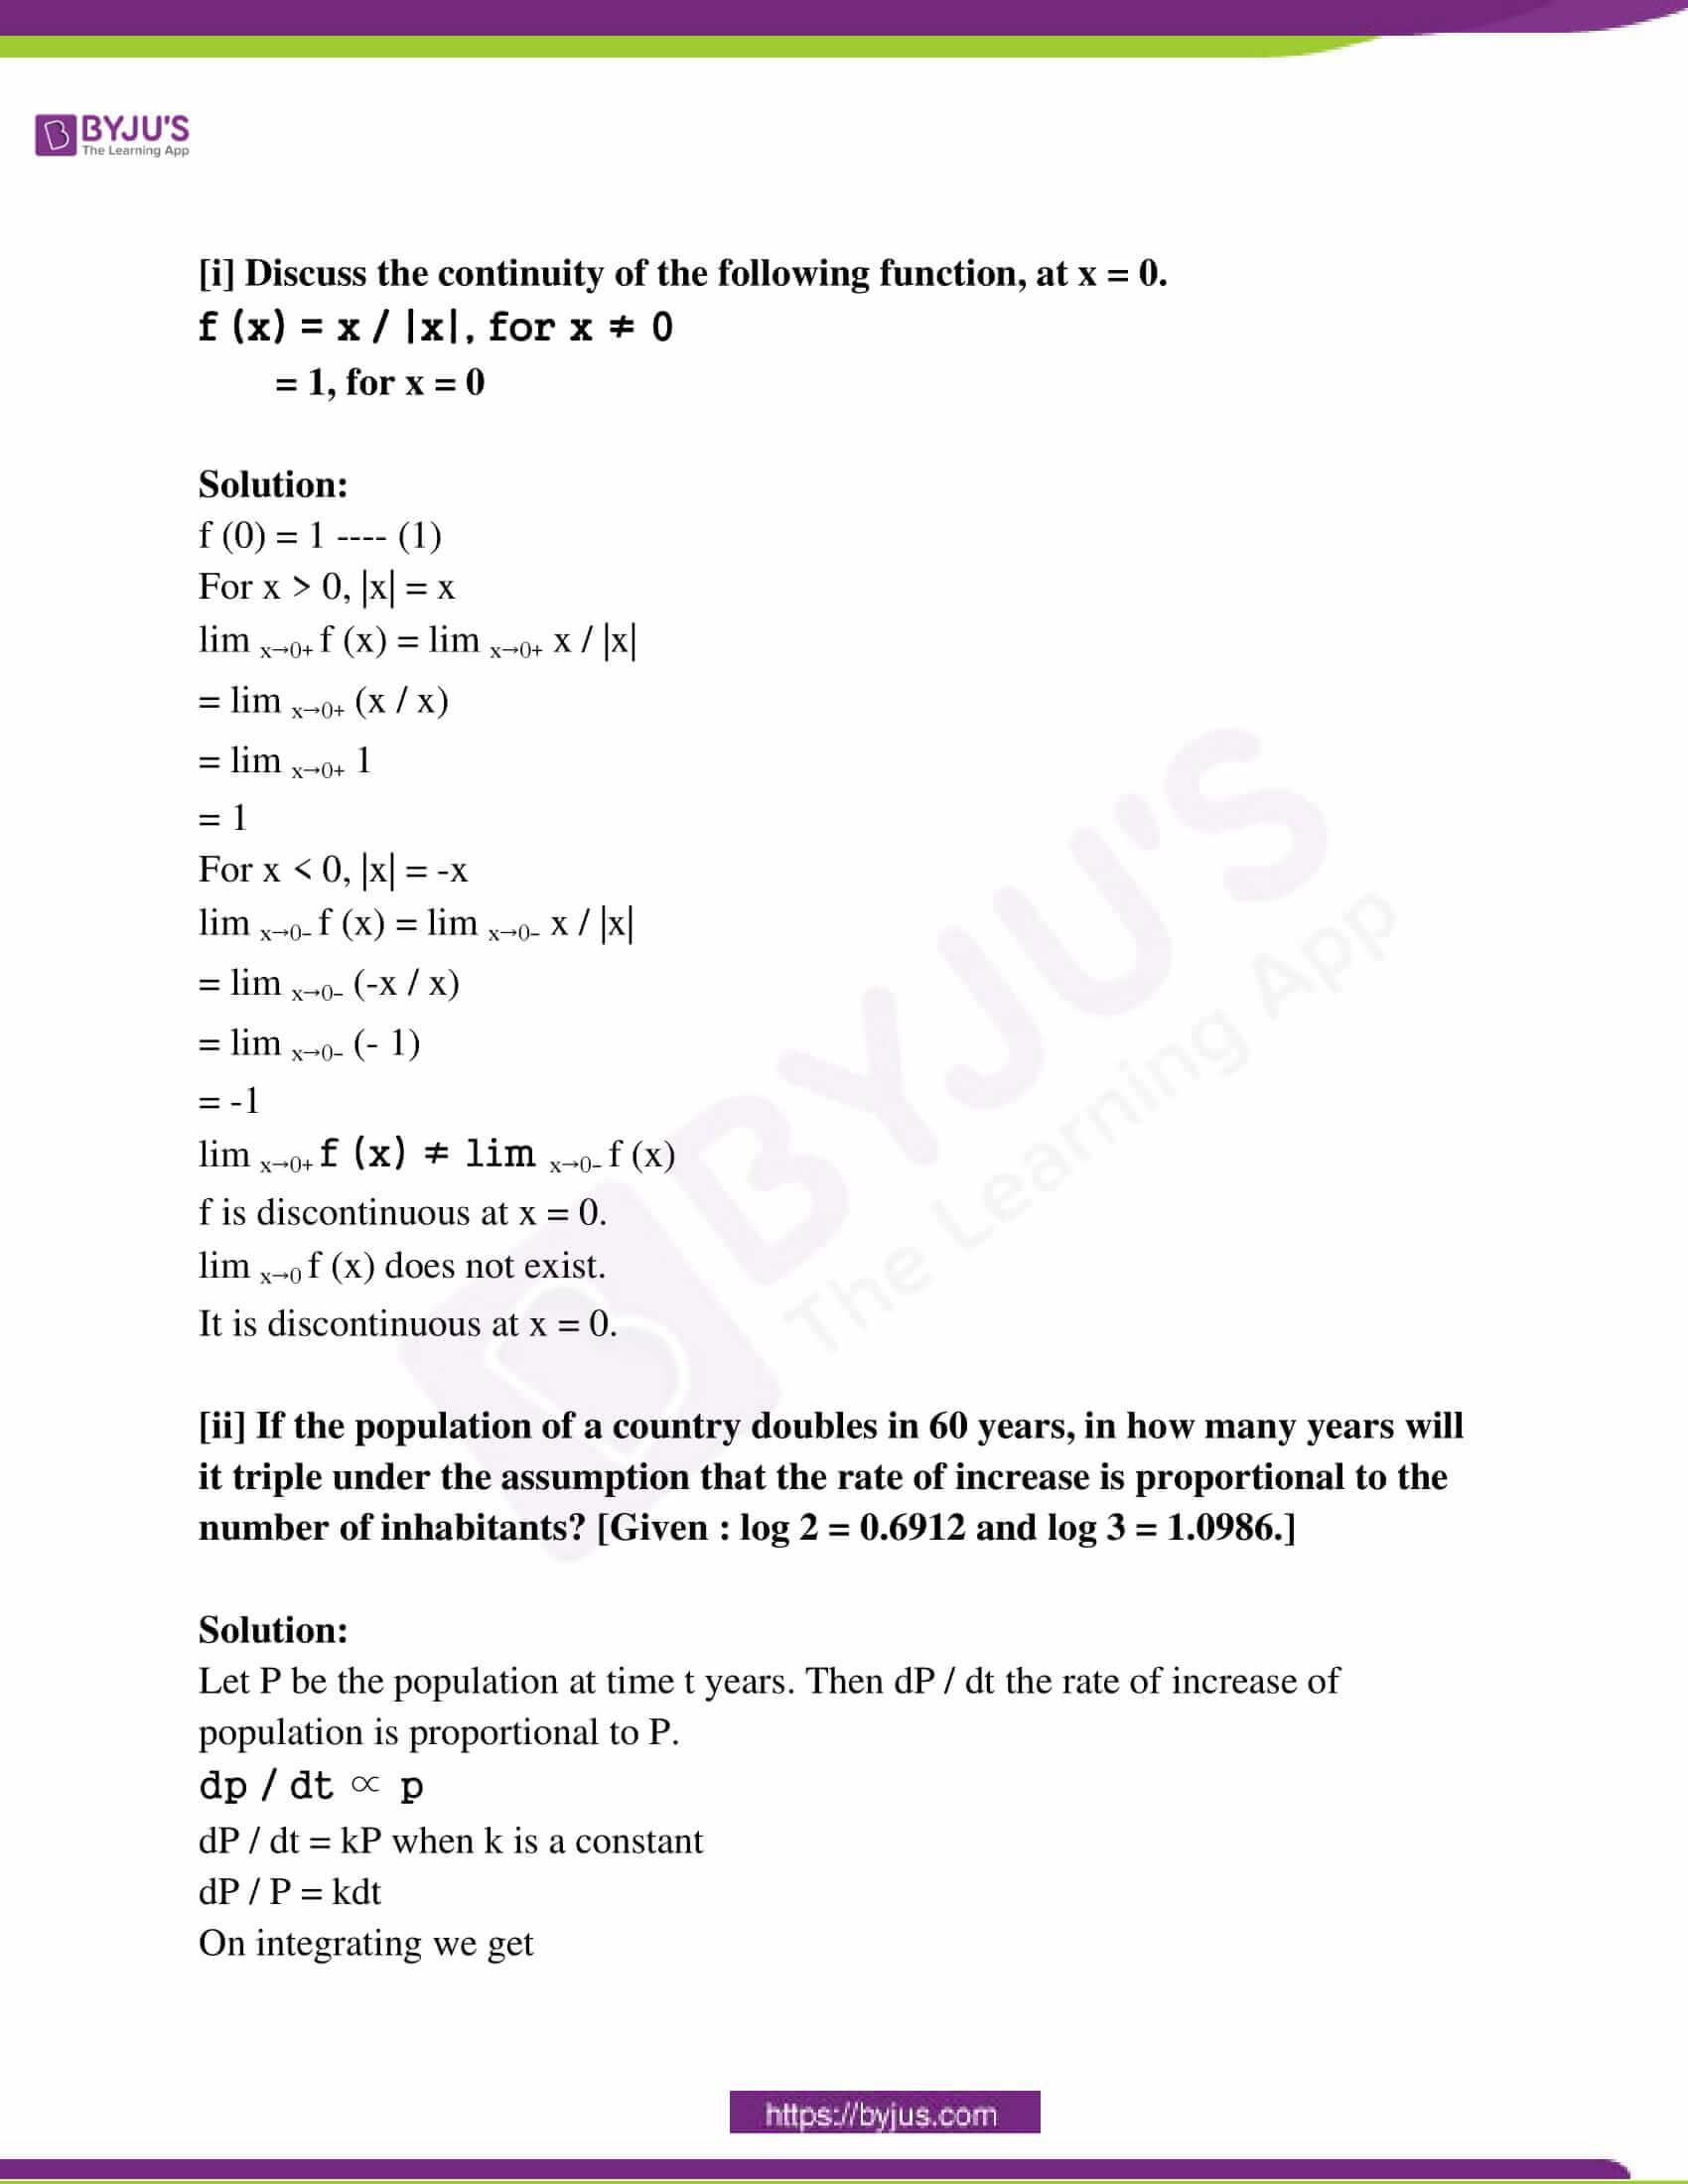 maharashtra class 12 exam question paper solutions march 2017 22